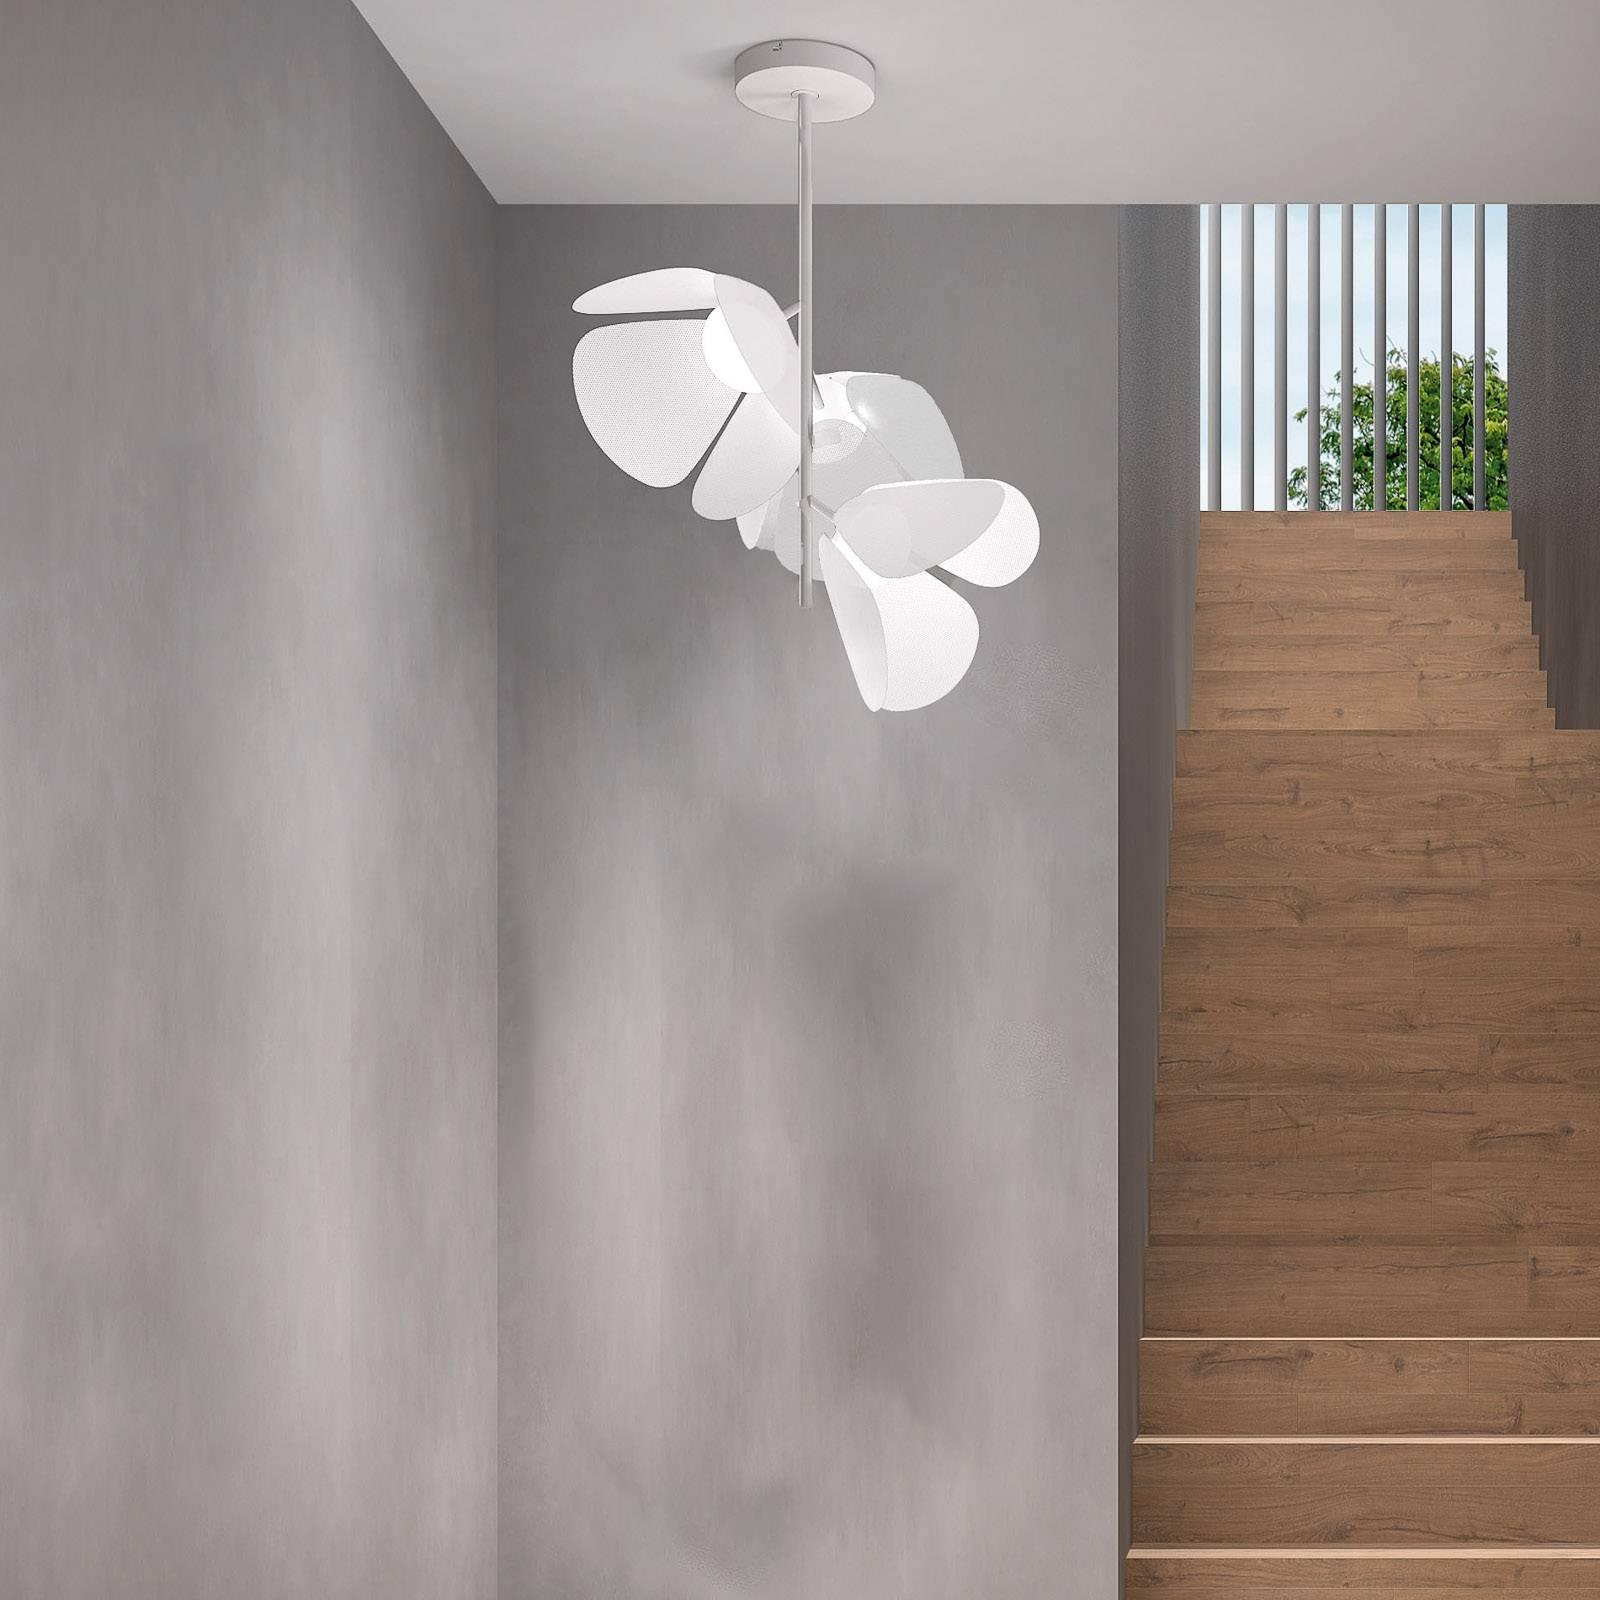 Bover Mod PF/73/3L LED plafondlamp, wit